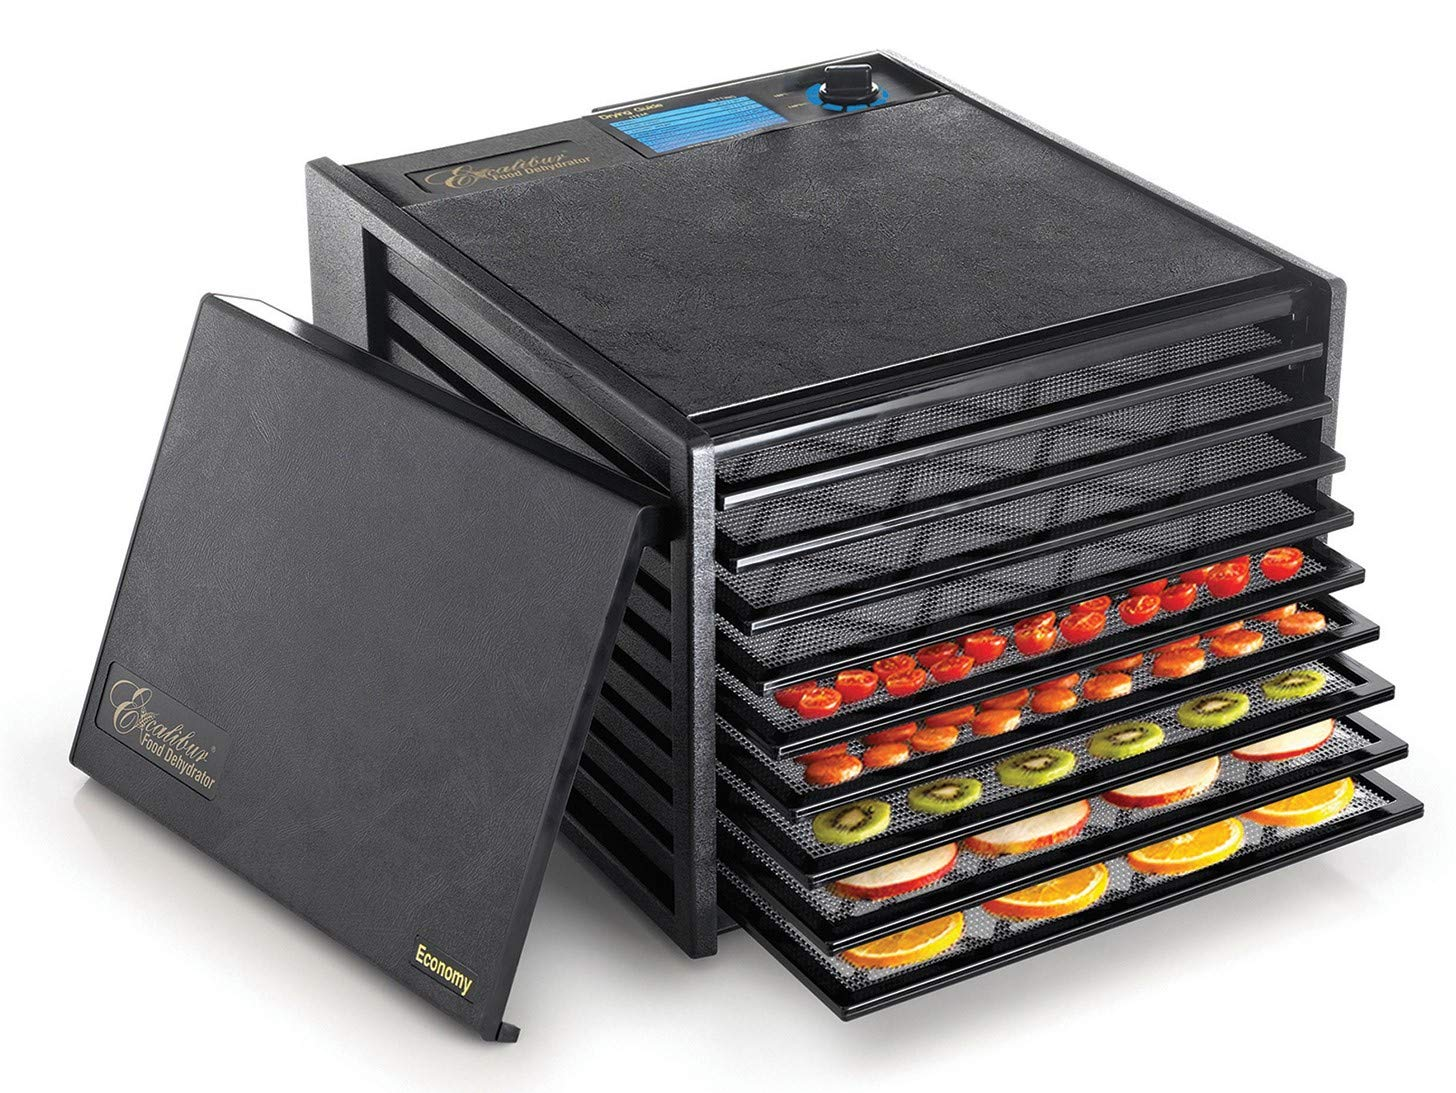 Excalibur 2900ECB-9 Food Dehydrator